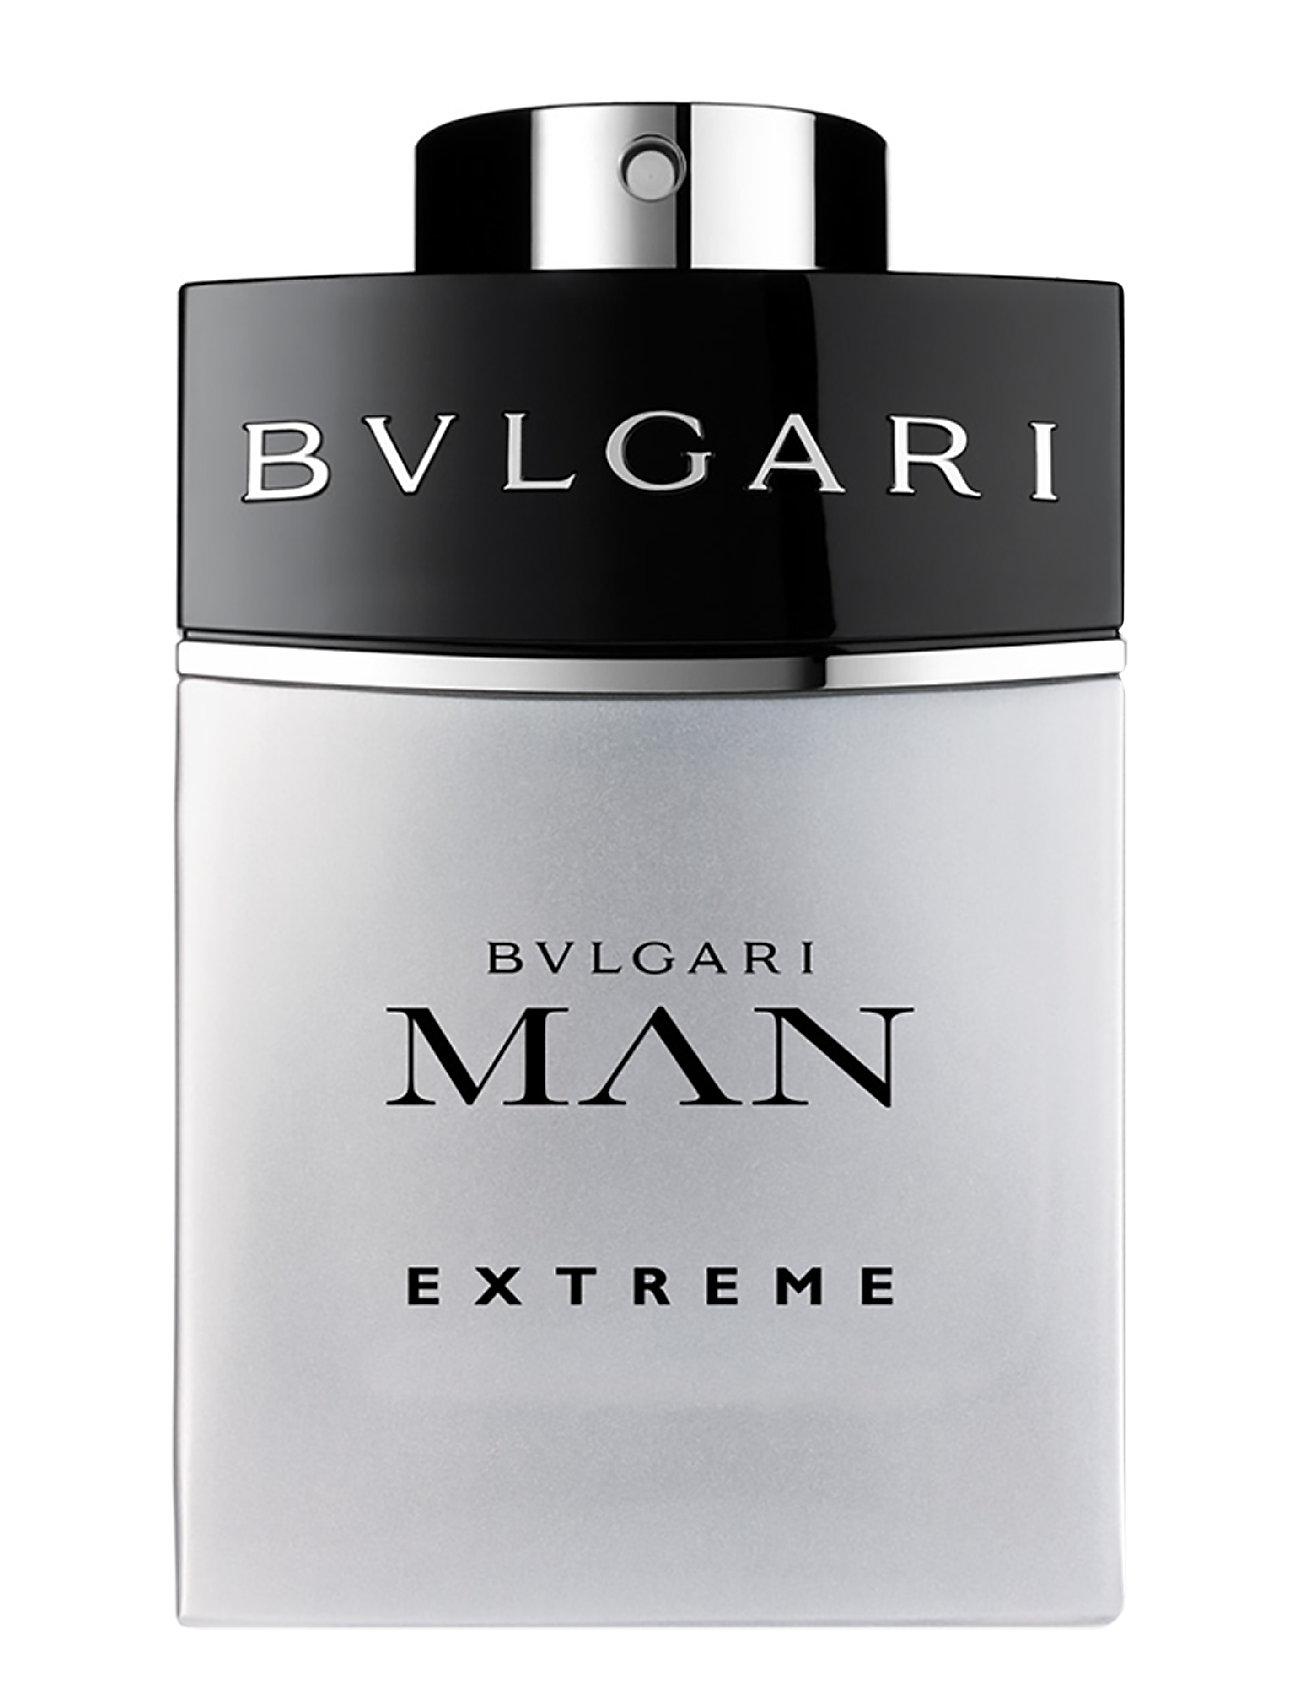 bvlgari B. man extreme edt vapo 60 ml fra boozt.com dk